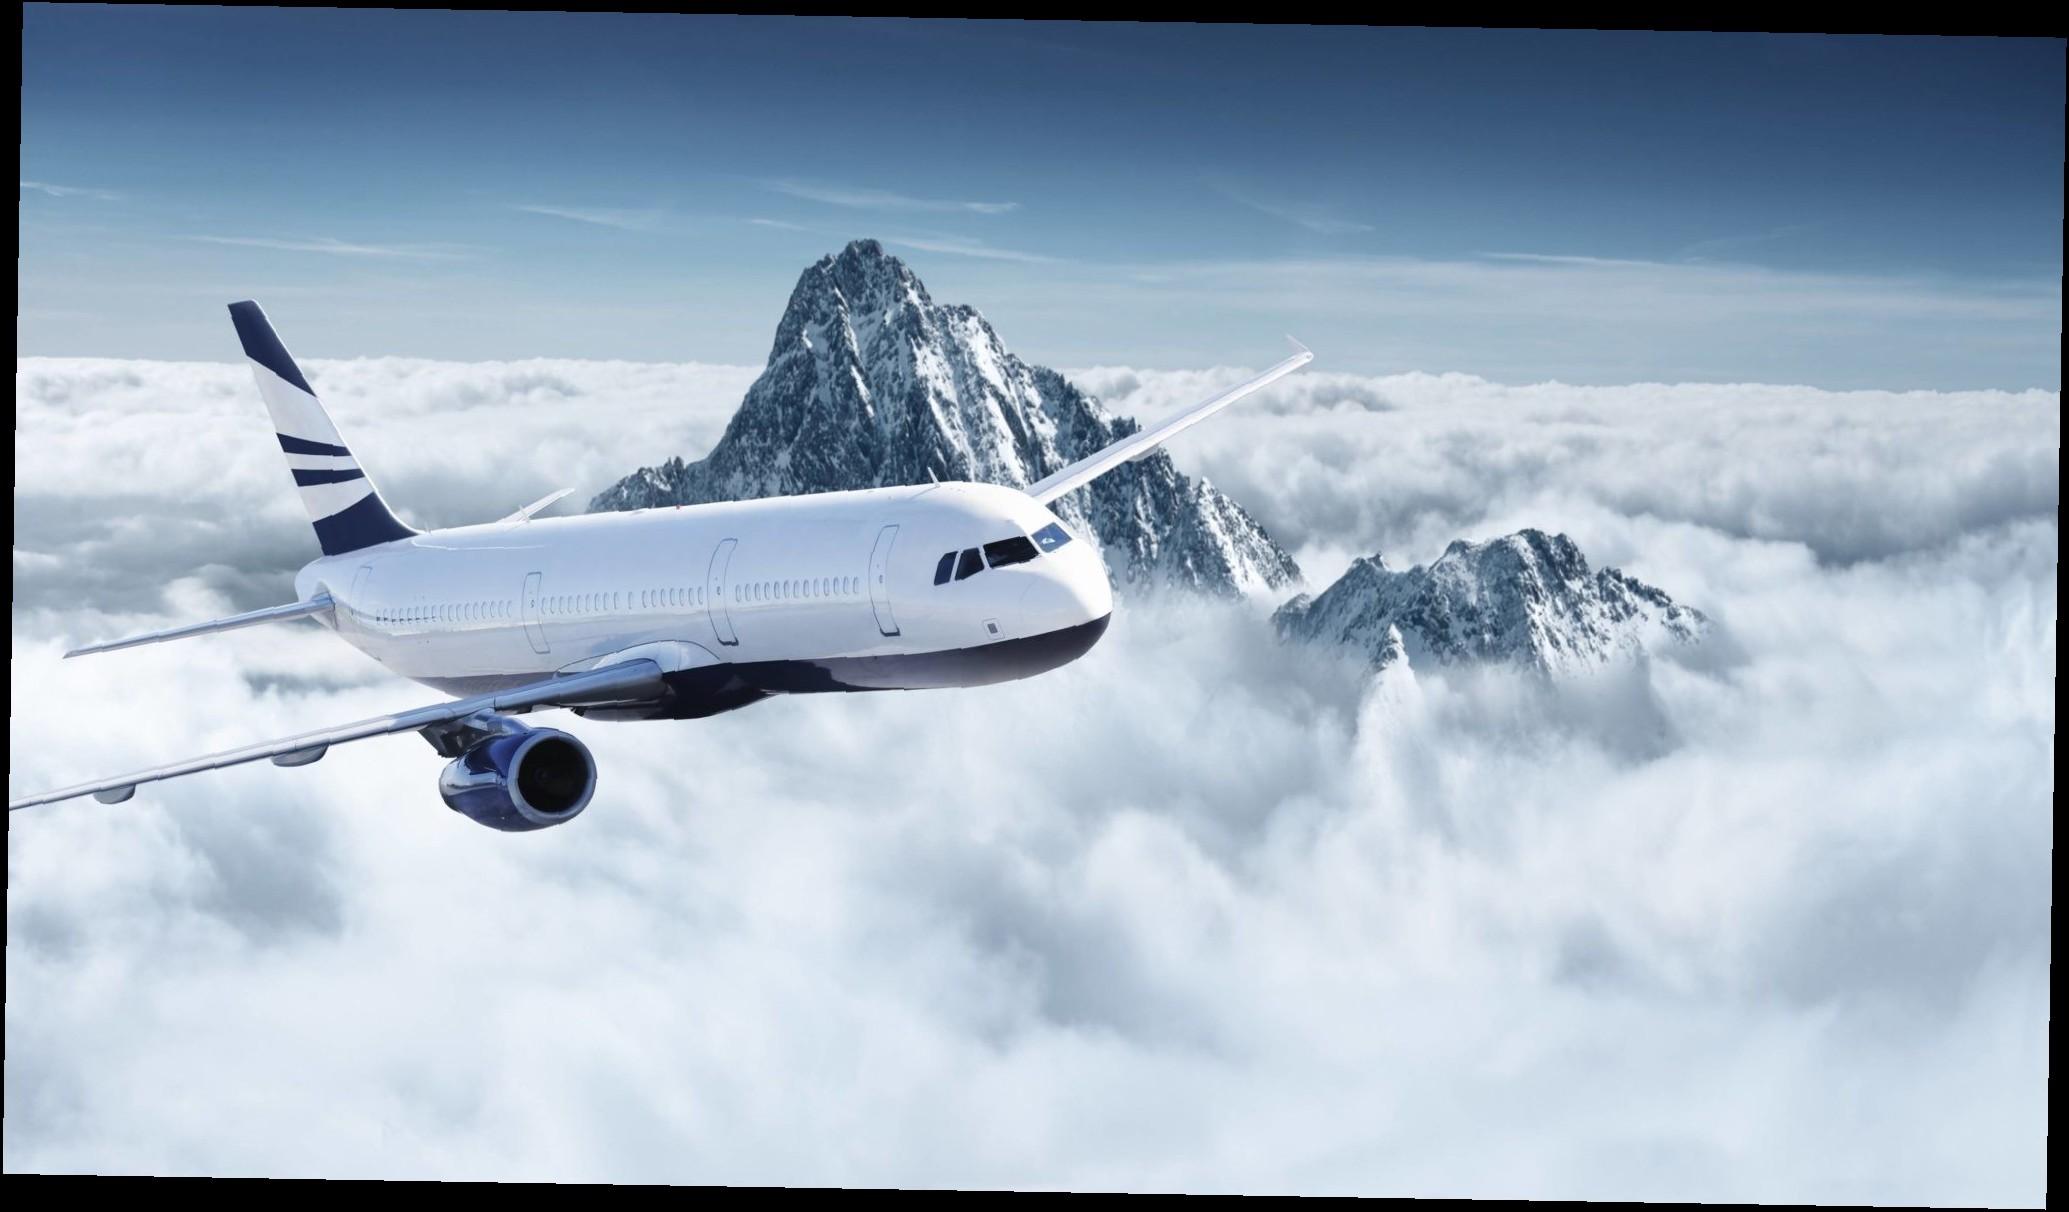 Аэропорт Сиди Бел Аббес (Sidi Belabbes) коды IATA: BFW ICAO: KBFW город: Сиди Бел Аббес (Sidi Belabbes) страна: Алжир (Algeria)